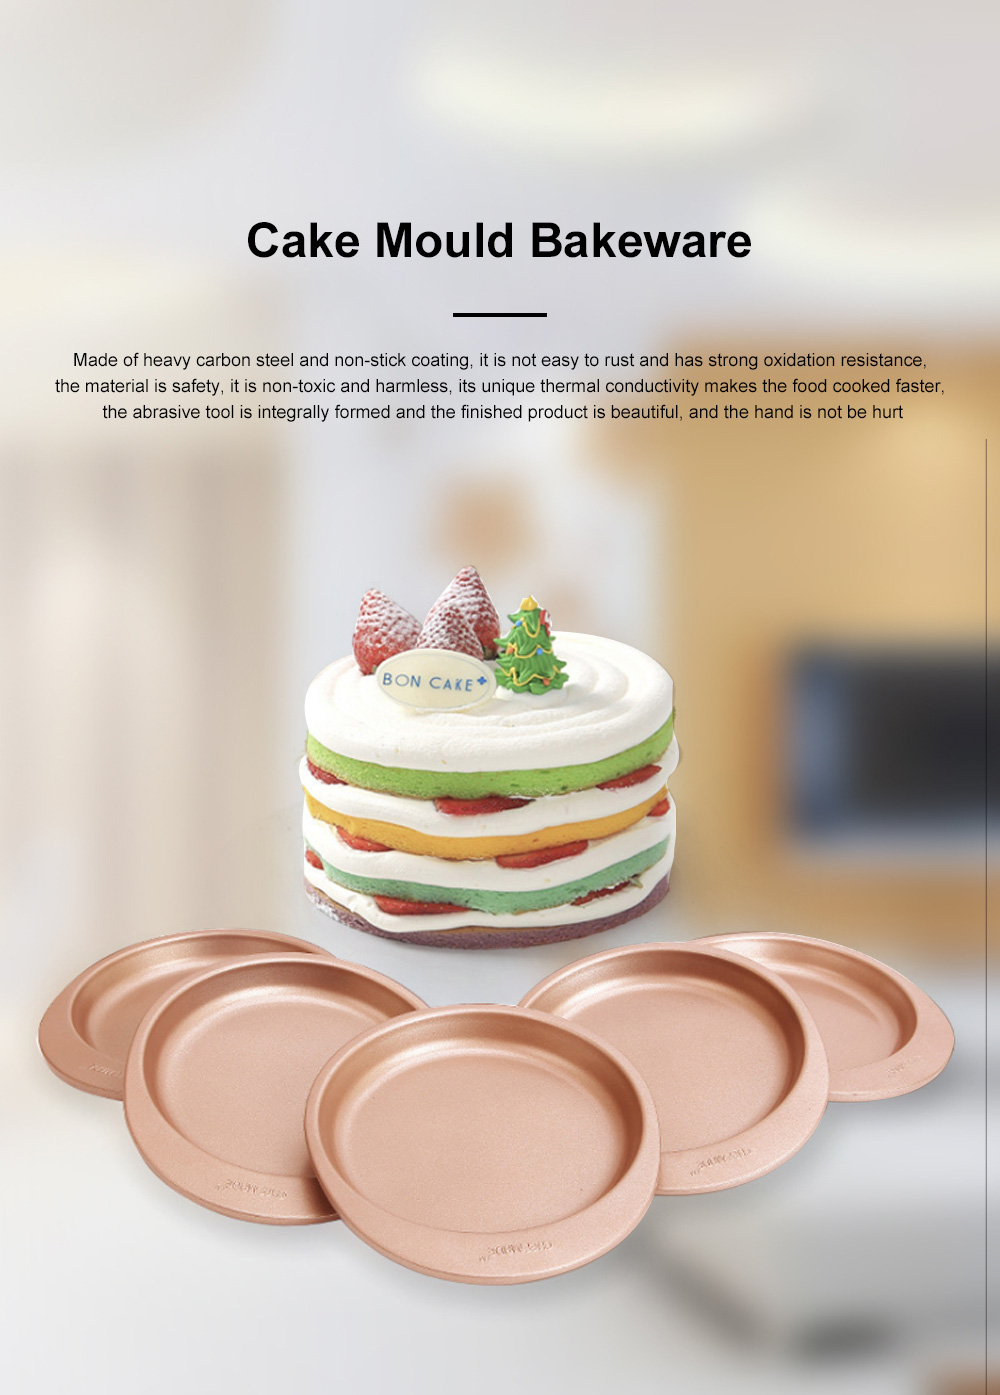 Chefmade Silicone Rainbow Cake Mould Bakeware Round DIY Baking Pan Silicone Cake Pans For Baking 5pcs 0